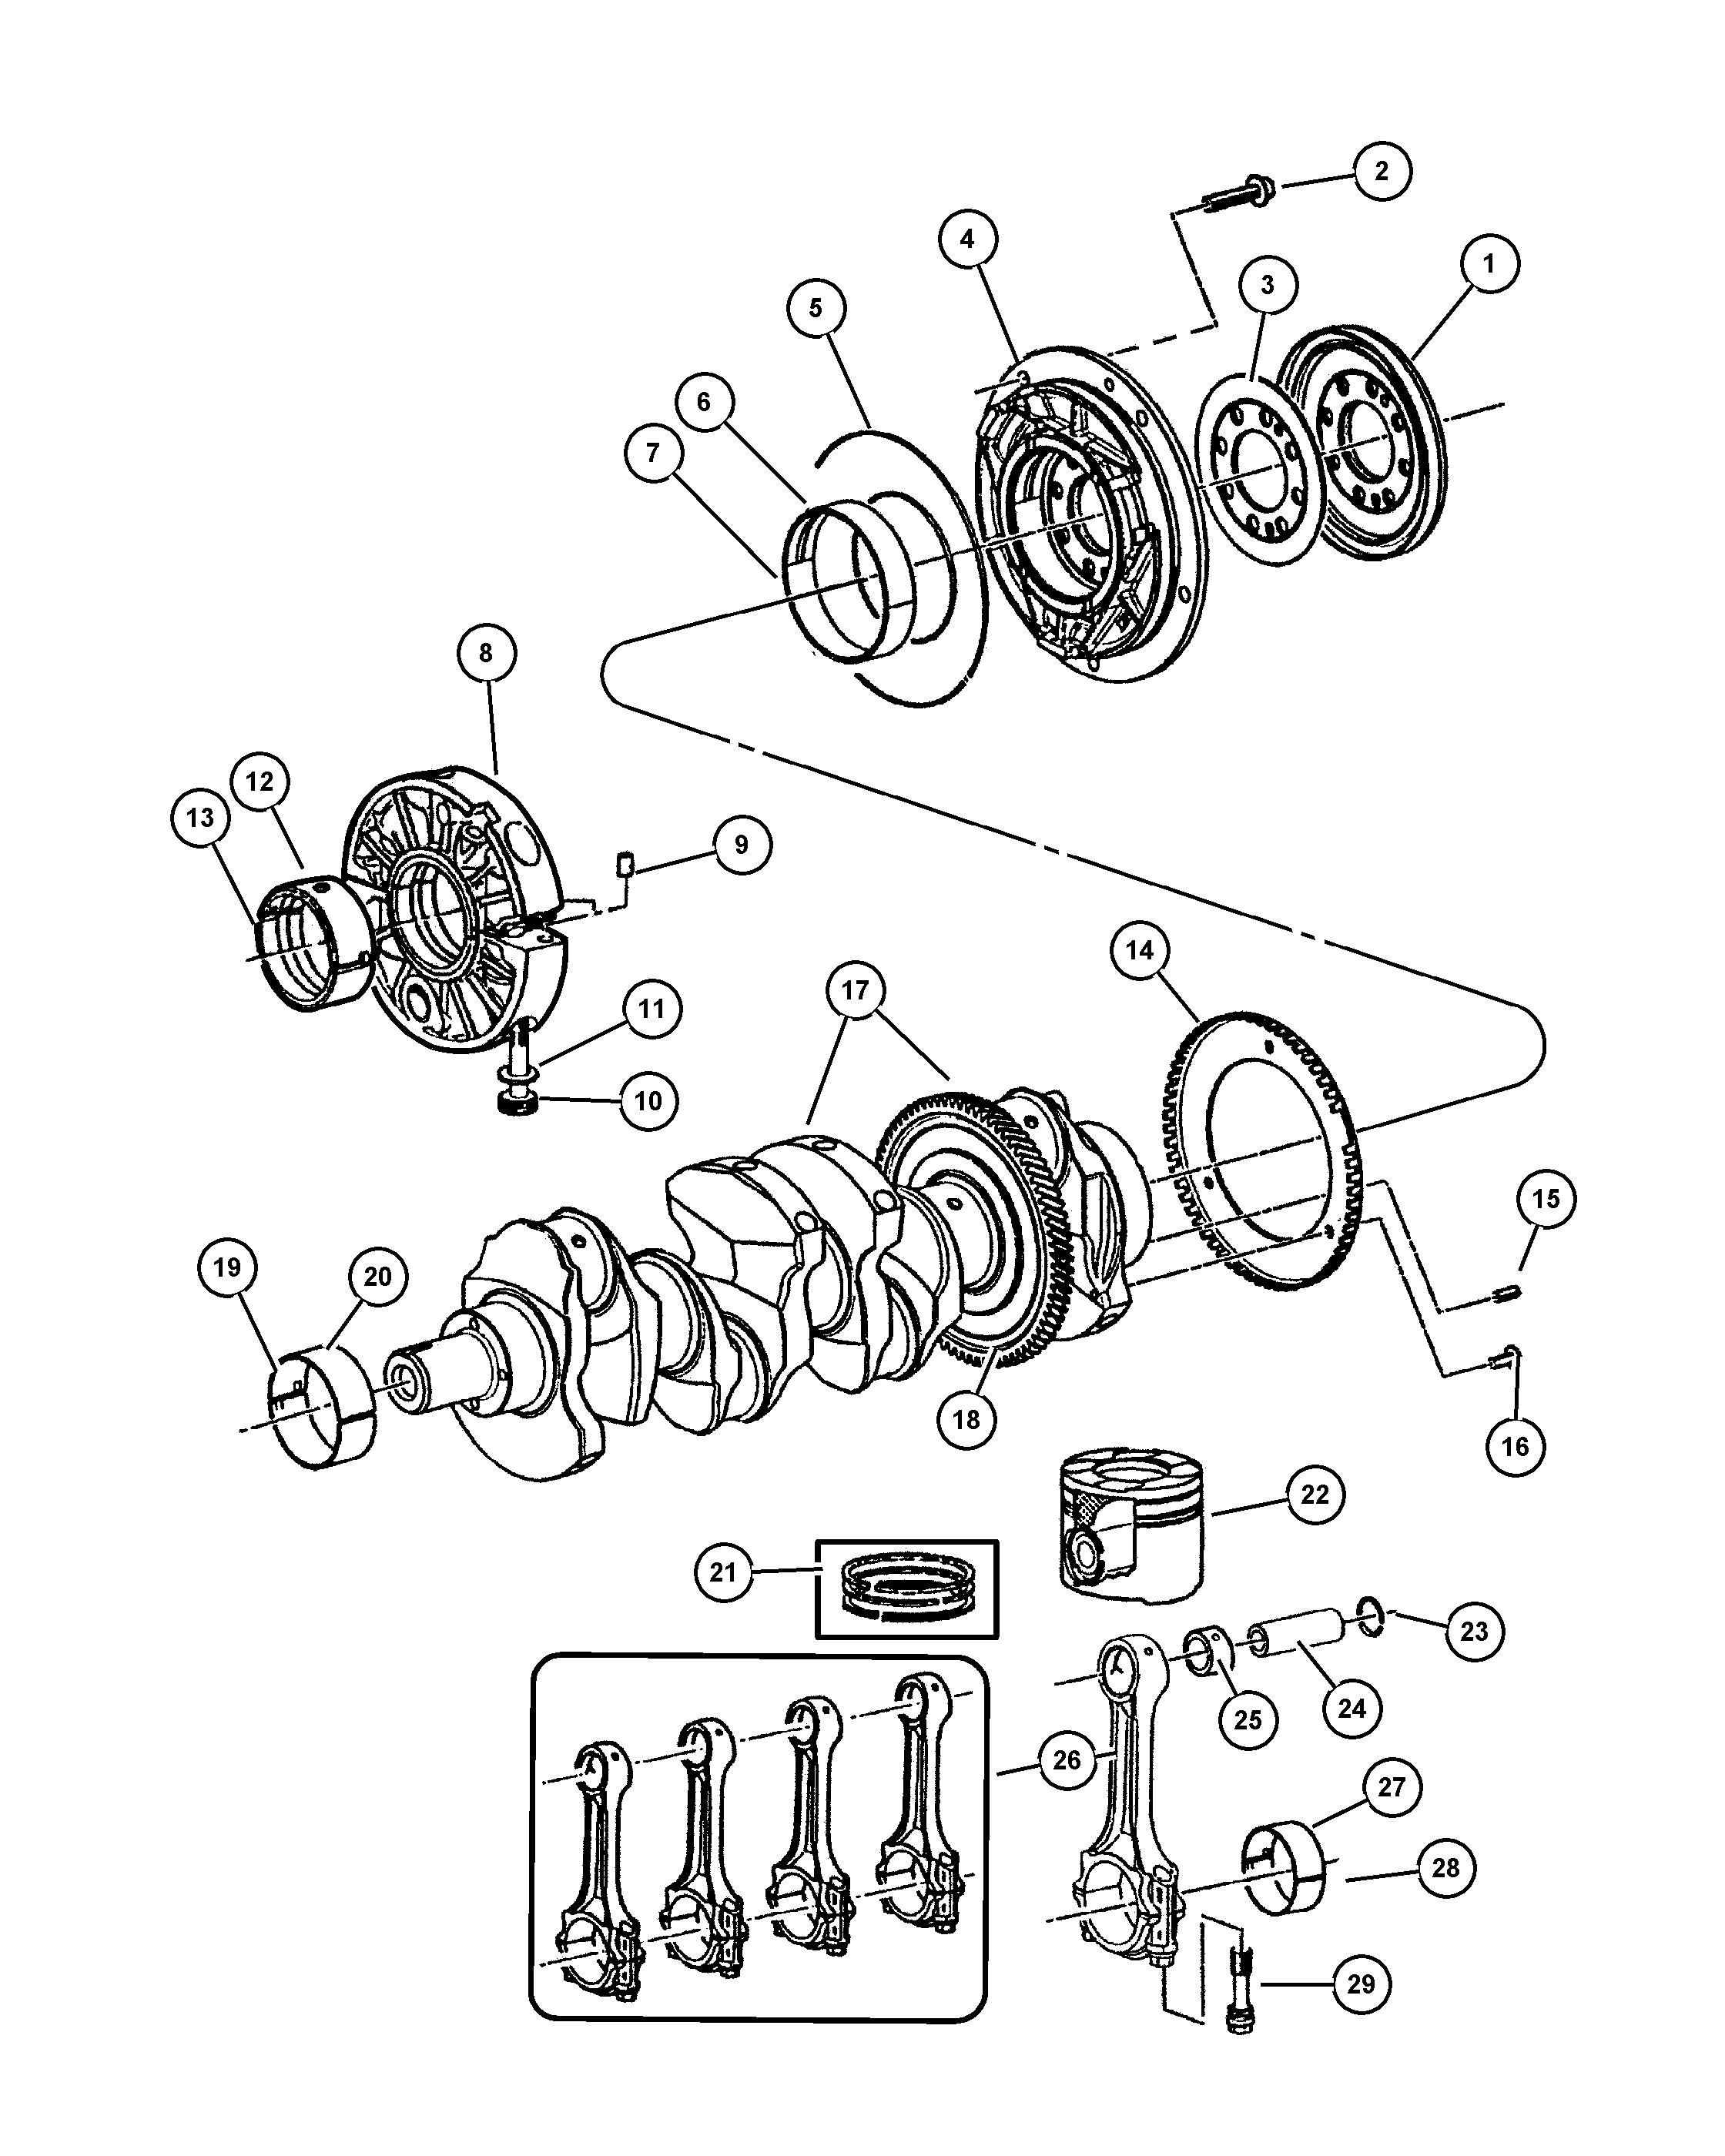 th350 parts diagram online wiring diagram Powerglide Transmission Parts Diagram 300m turbo wiring diagram databasechrysler 2004 kj jeep liberty 28l engine 2 8l four cylinder 300m